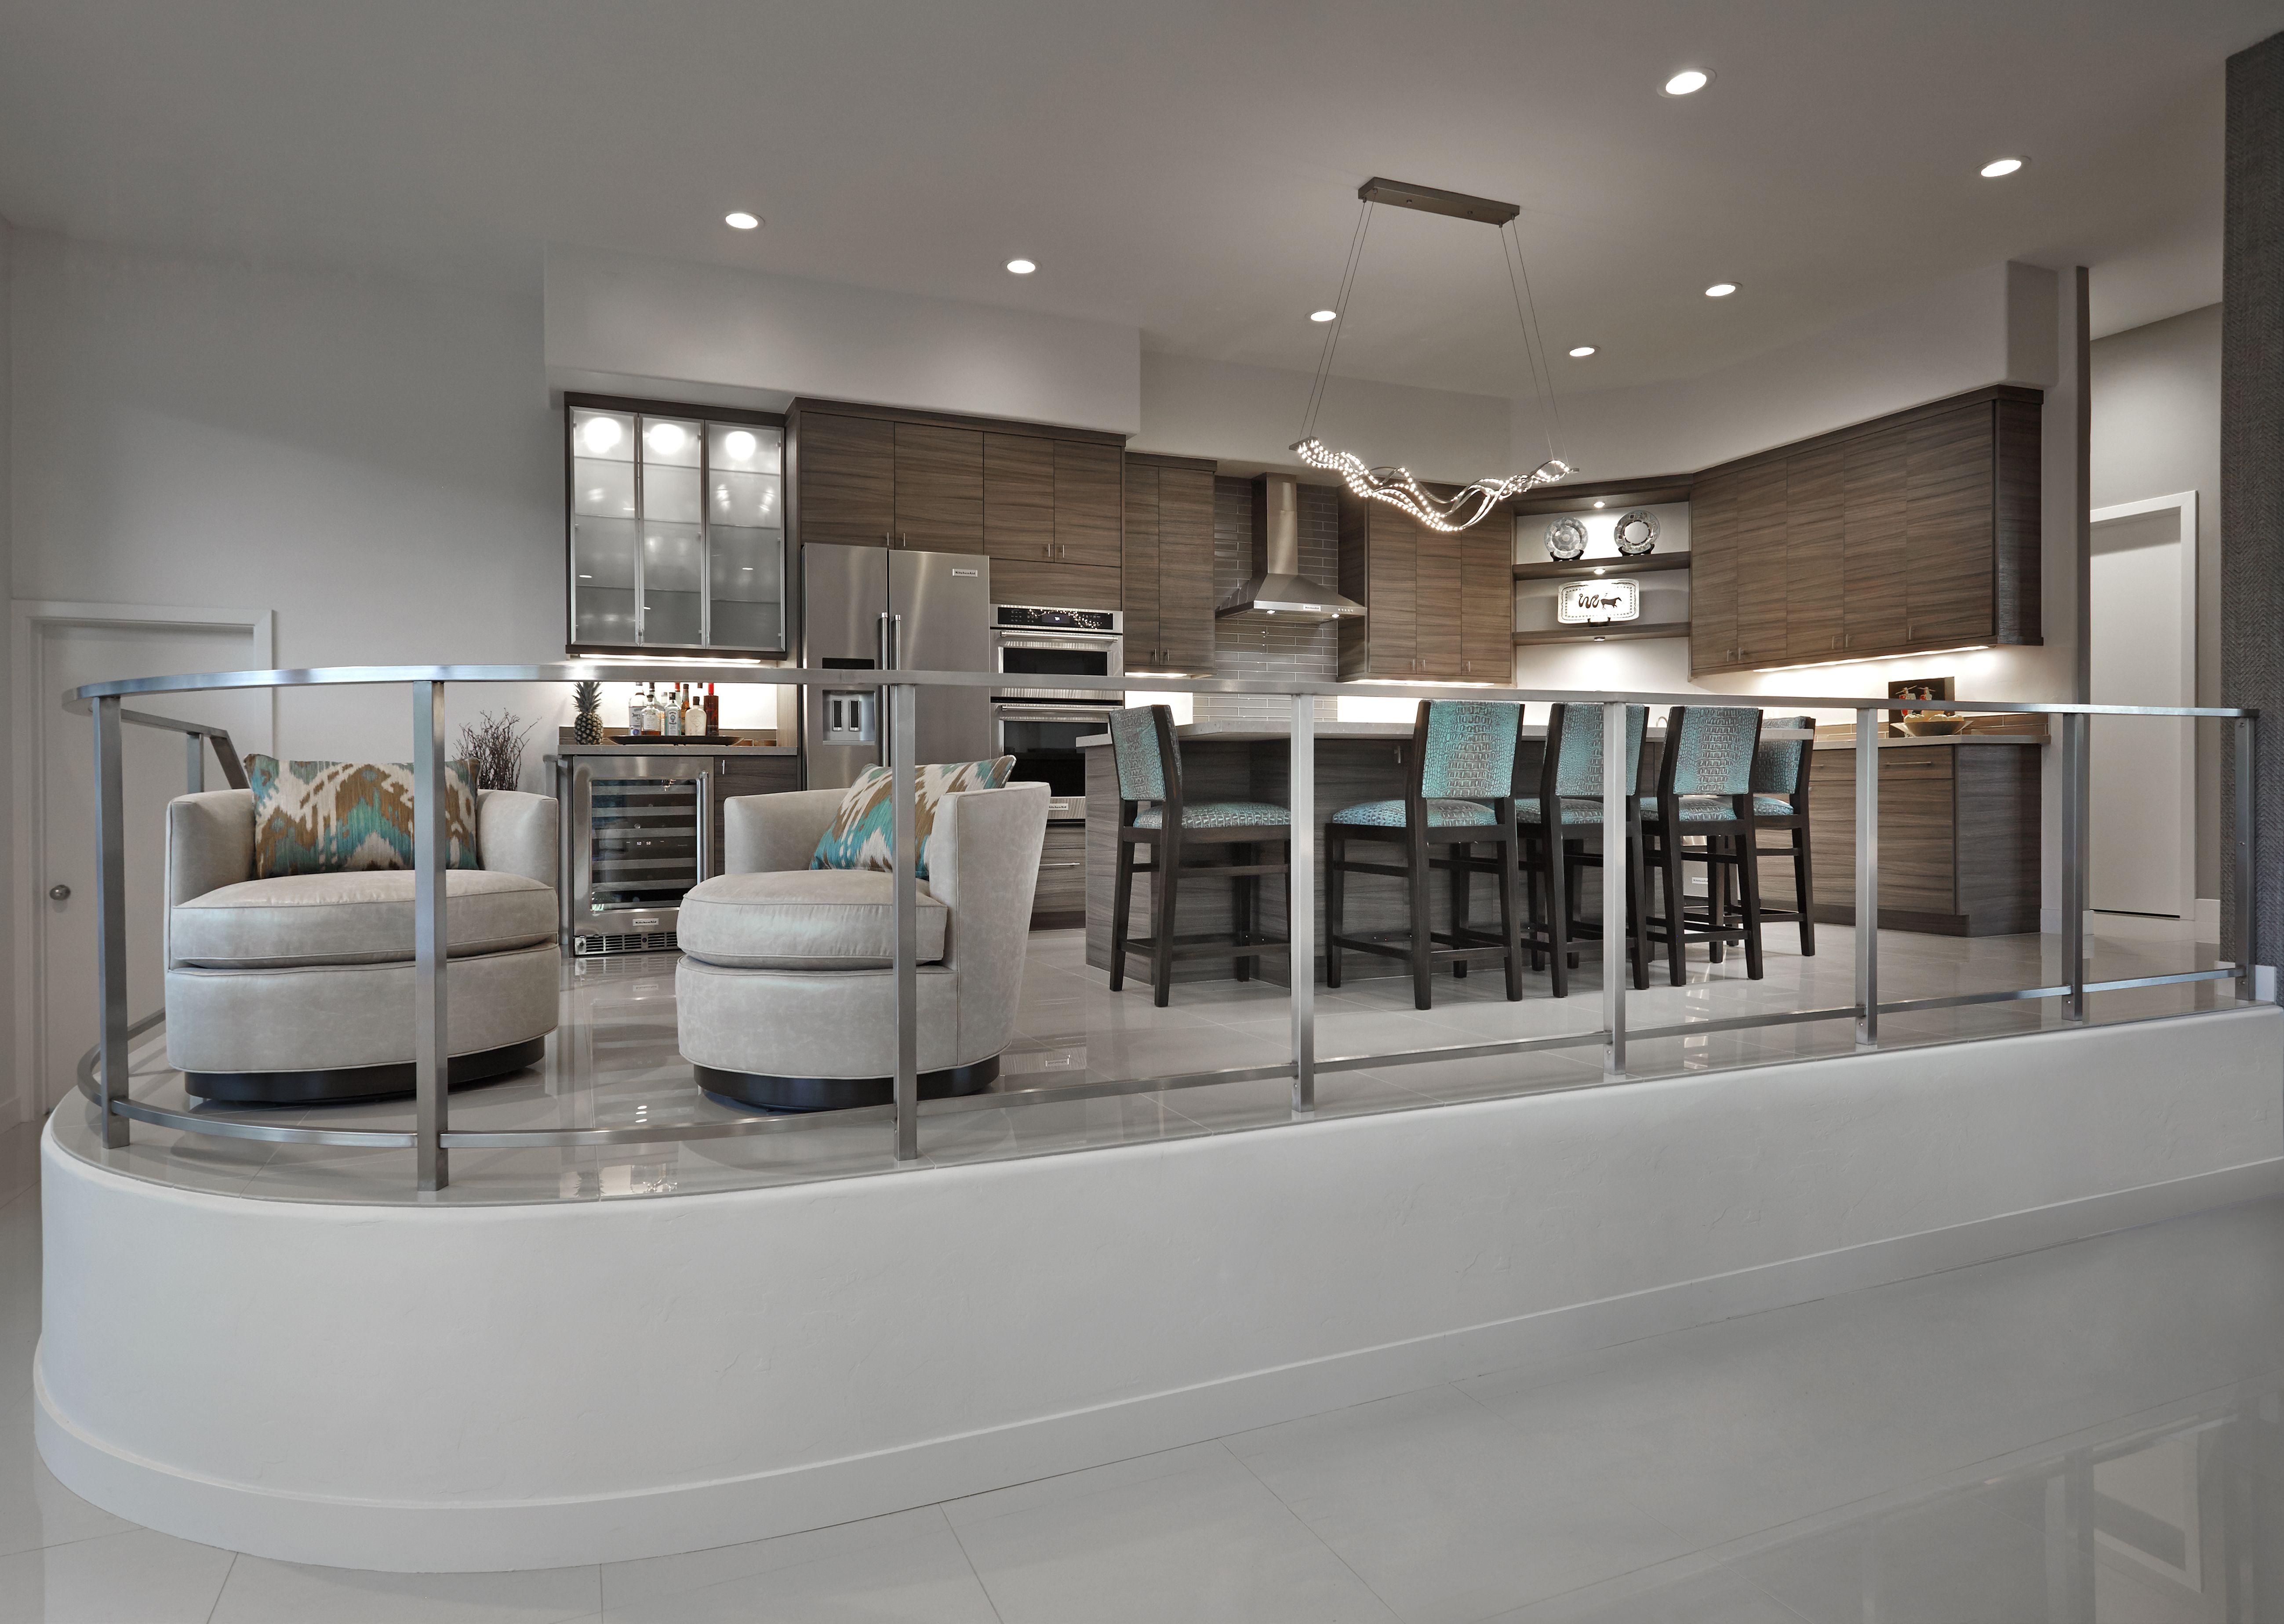 desert modern kitchen entertaining a recent kitchen remodel rh pinterest com